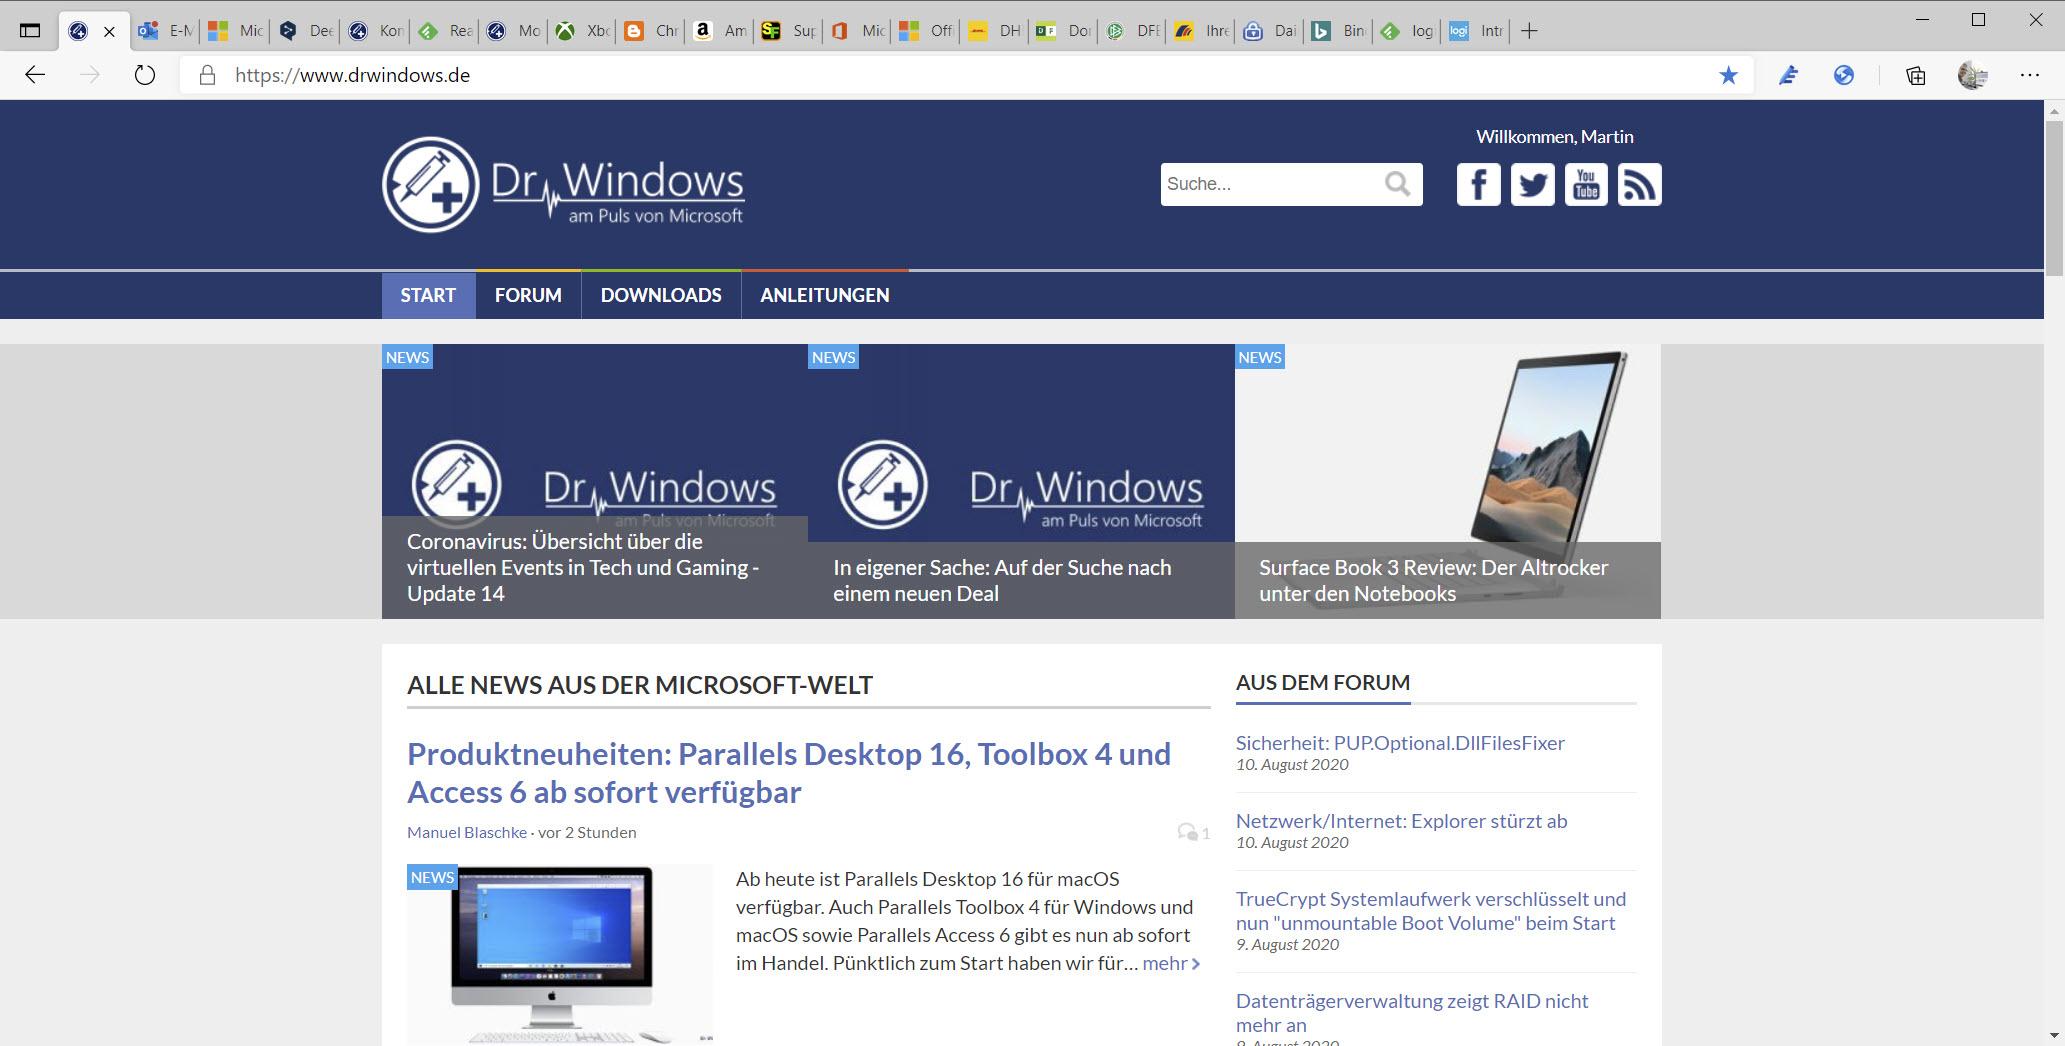 Microsoft Edge mit horizontaler Tab Leiste